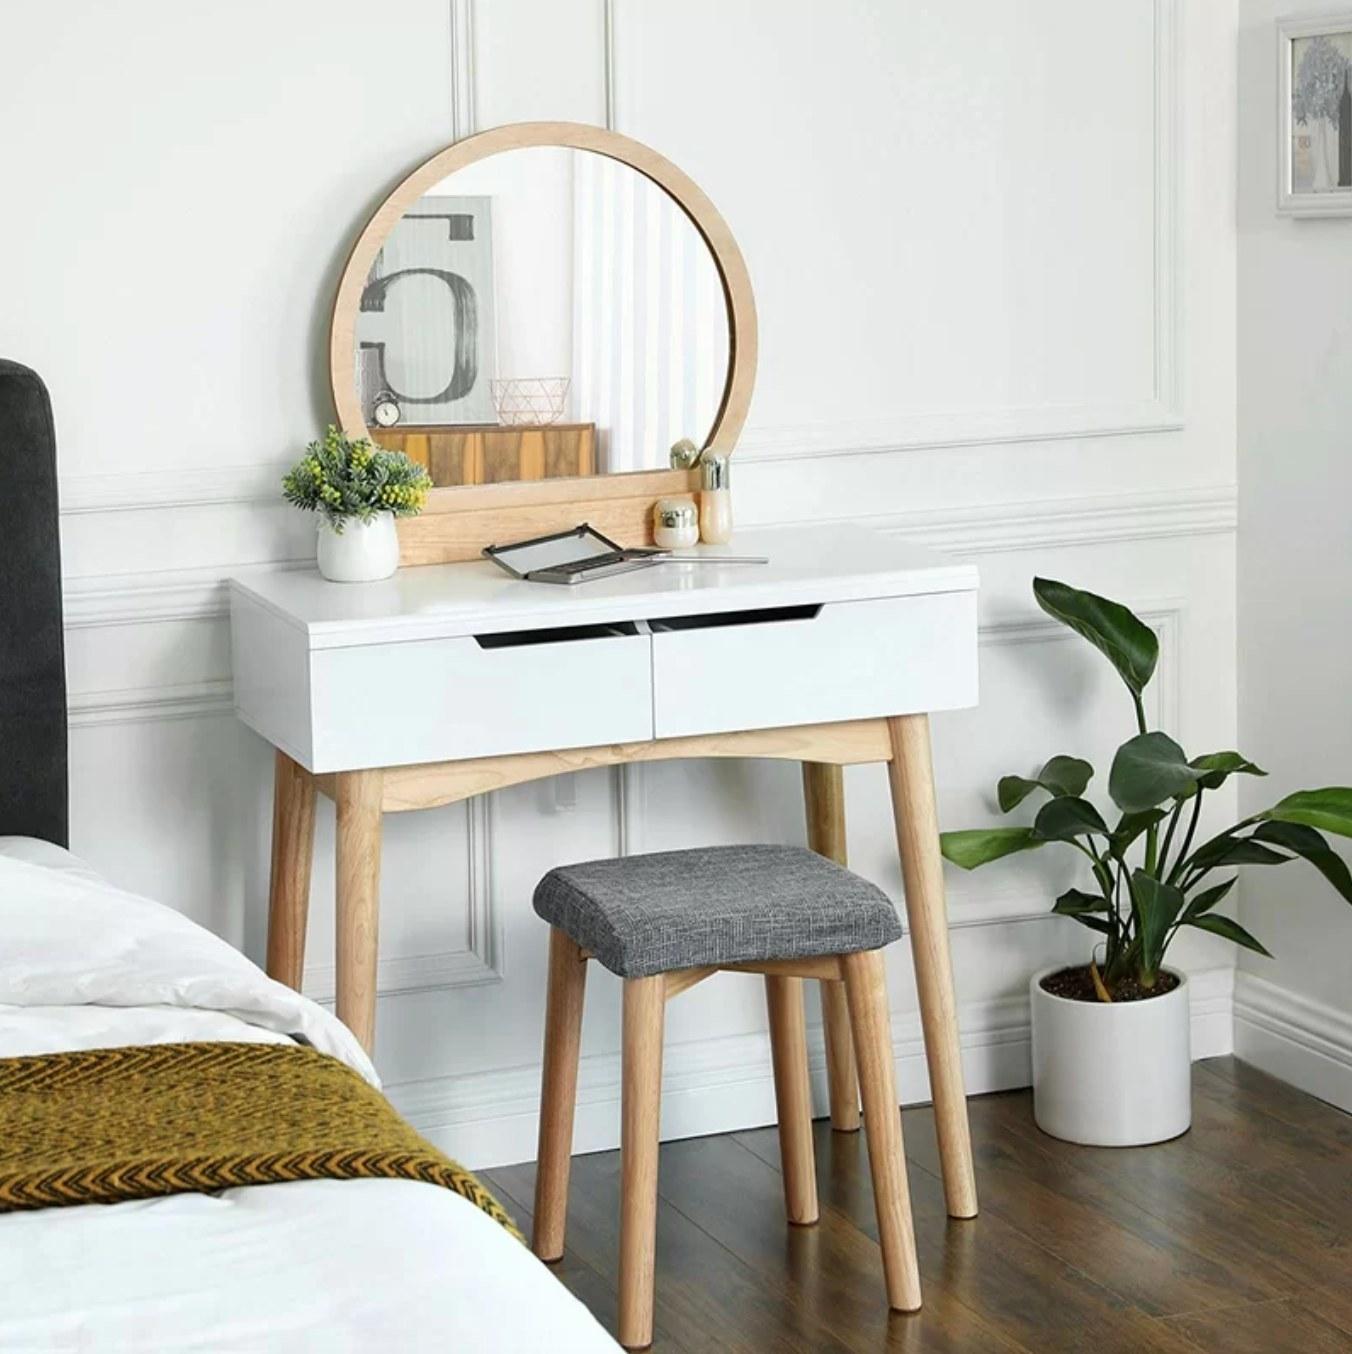 The vanity stool set in white